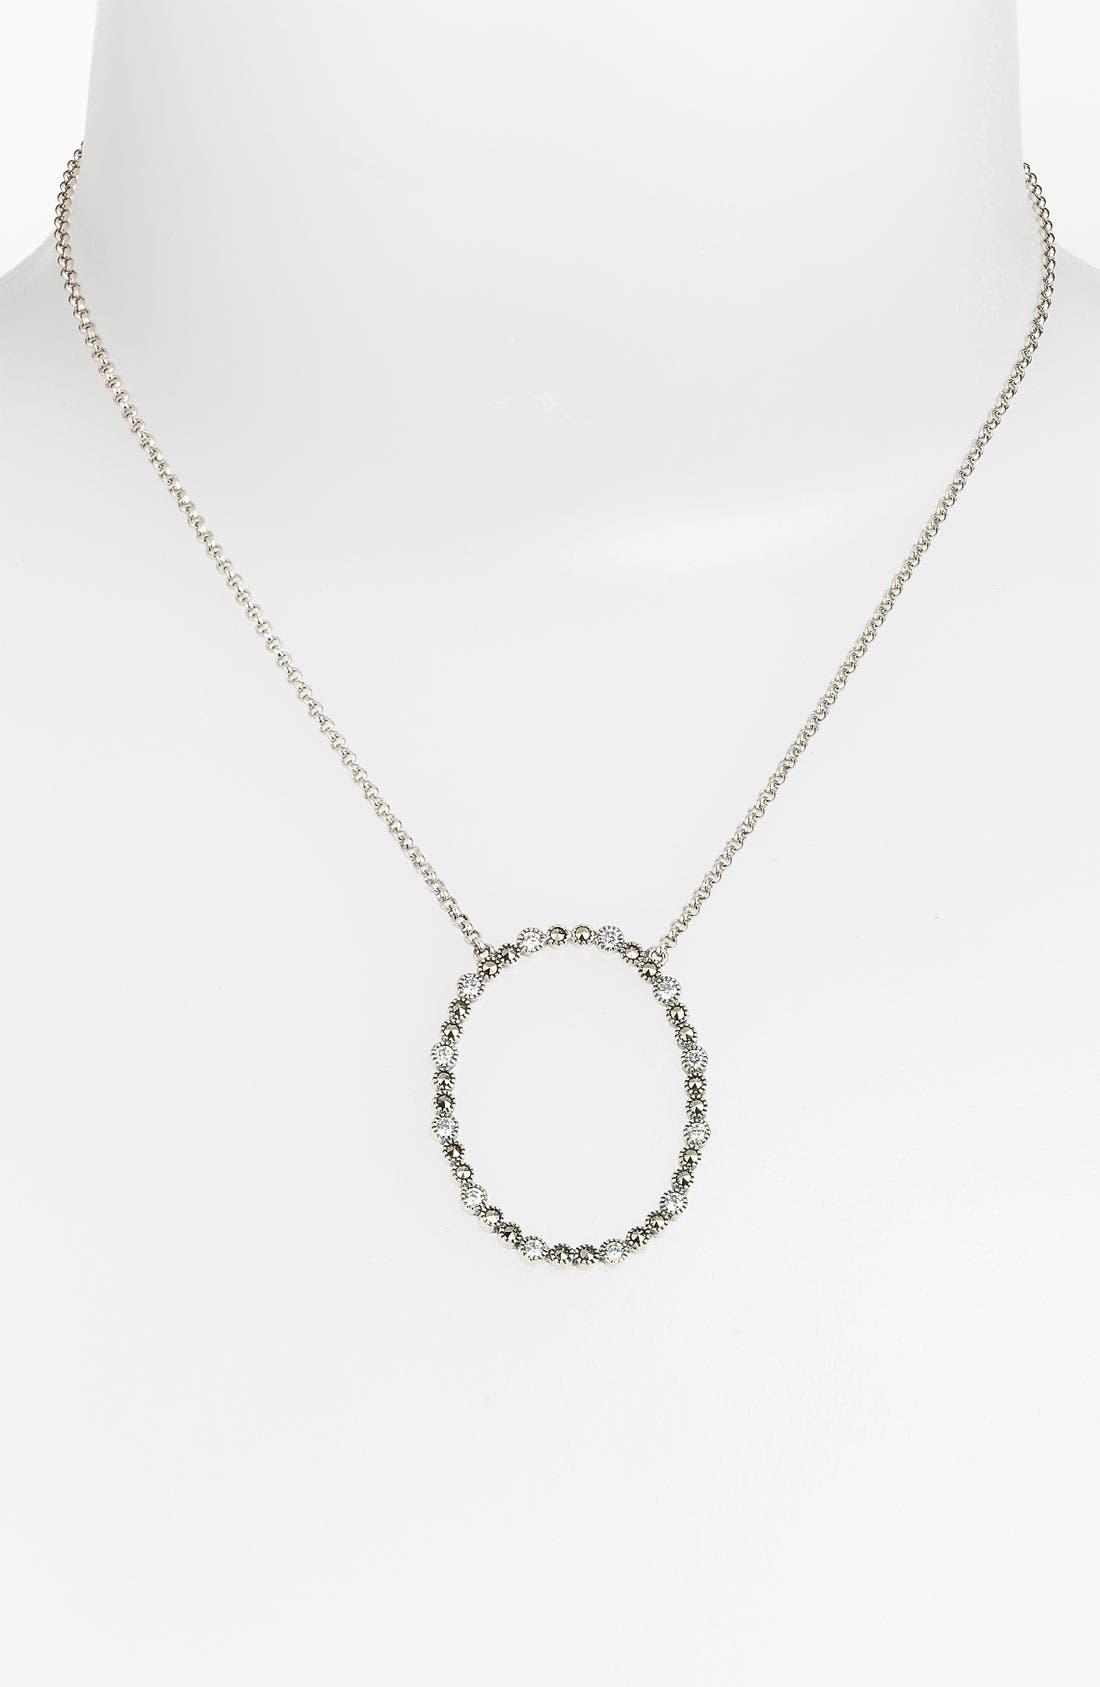 Main Image - Judith Jack 'Starlight' Open Pendant Necklace